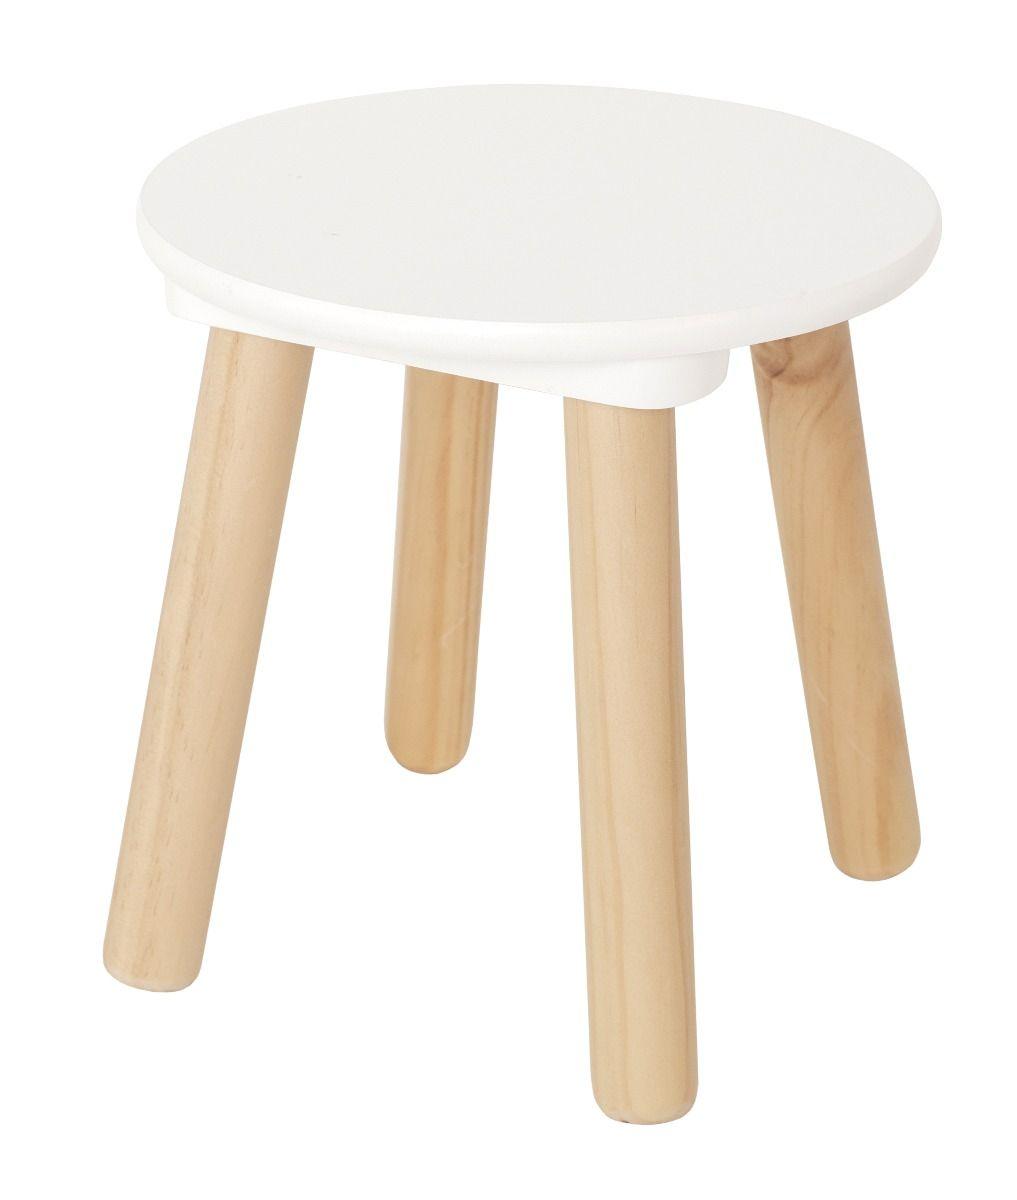 Holz Kinder-Hocker weiß natur